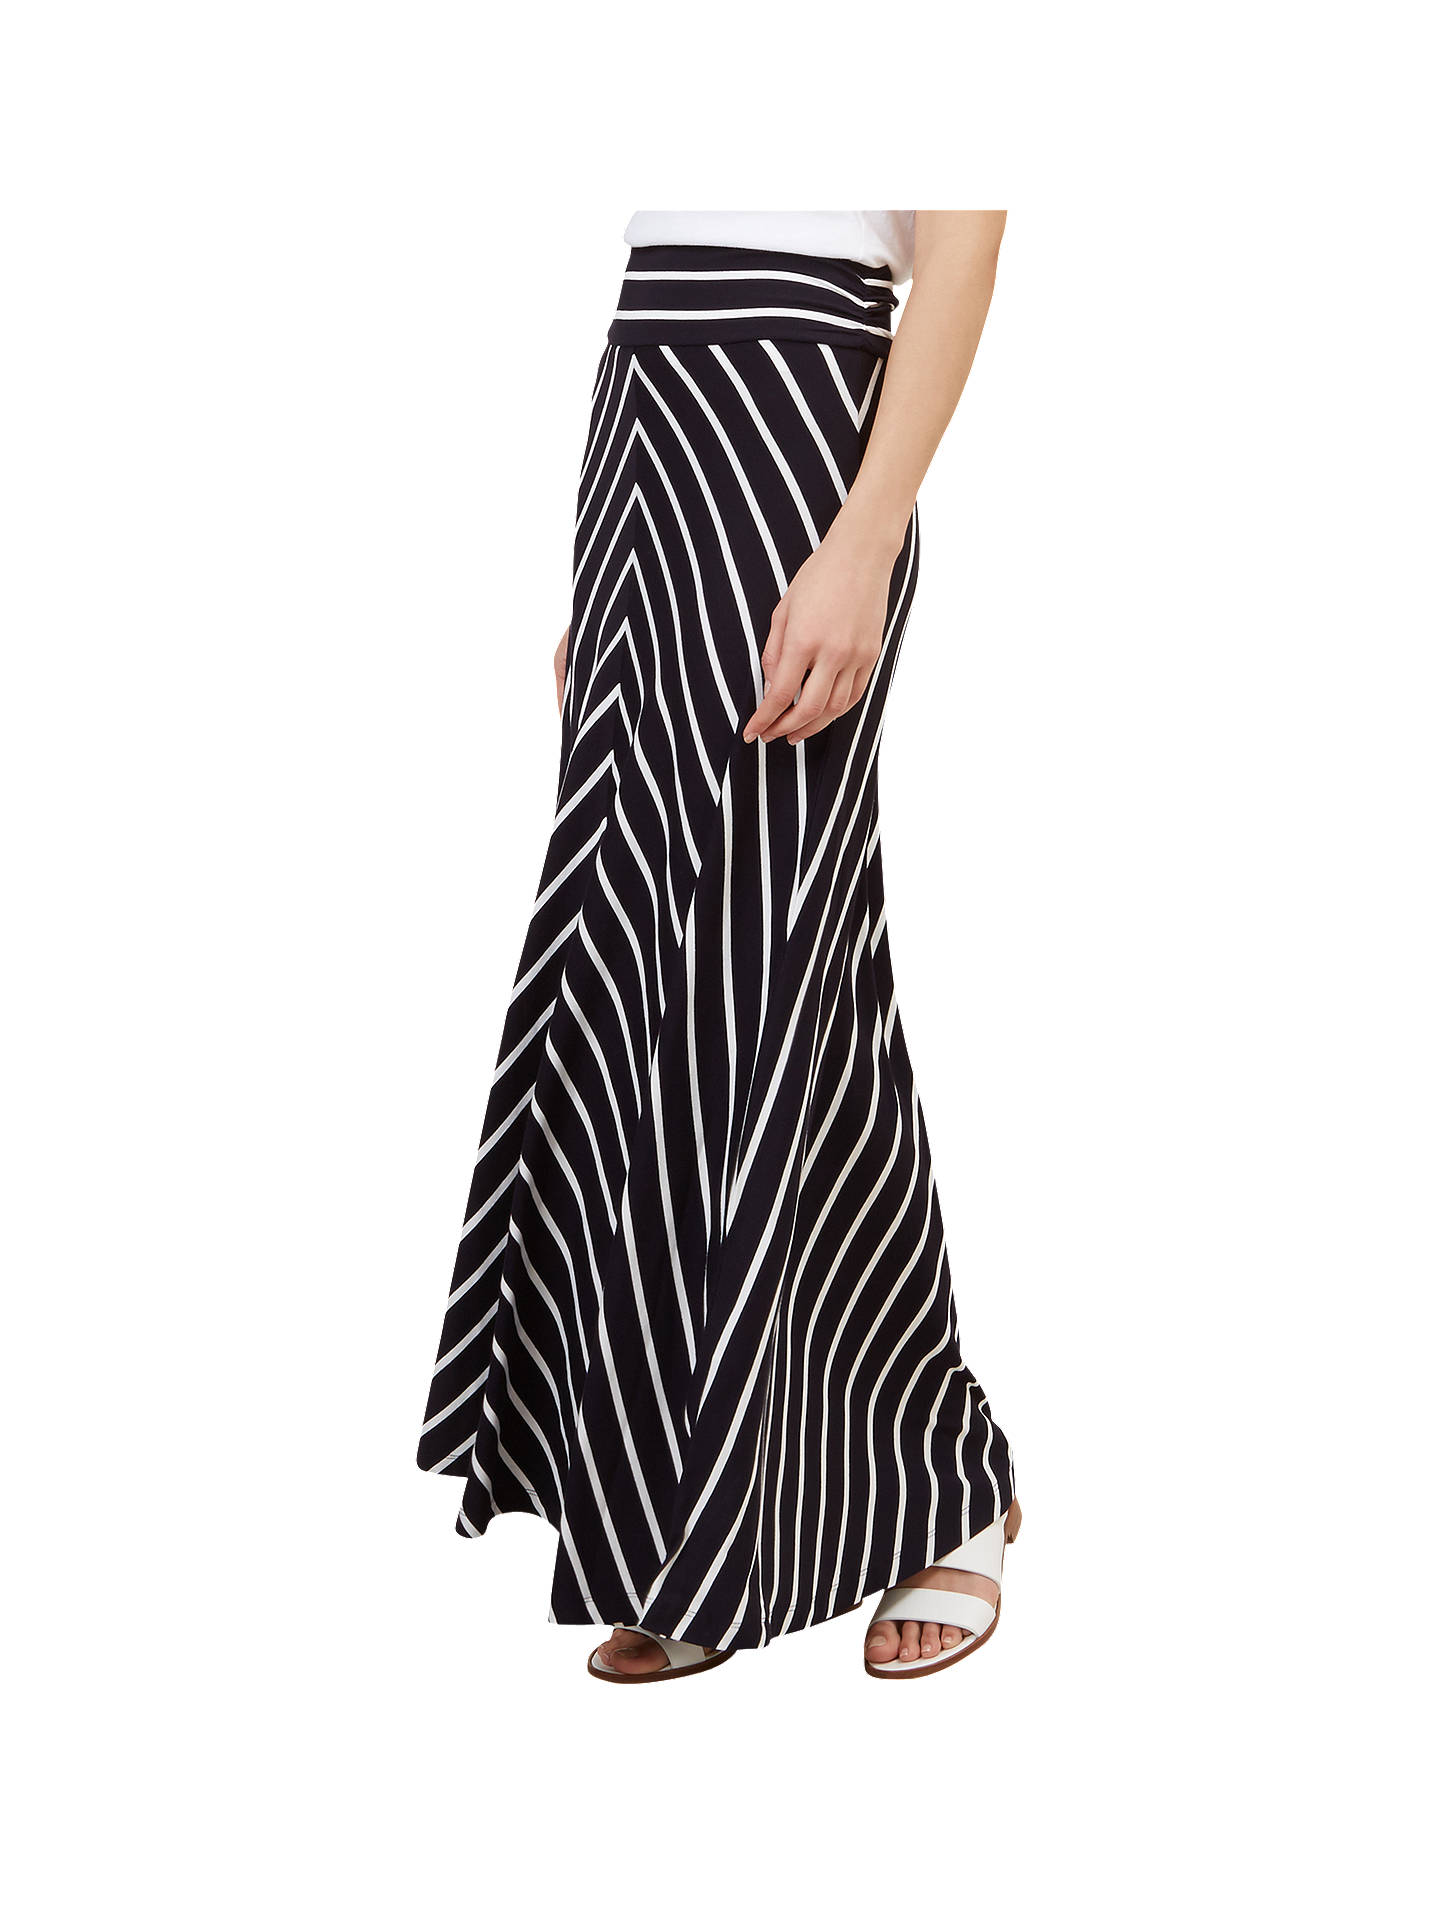 8f51384f5eebd BuyHobbs Iris Striped Maxi Skirt